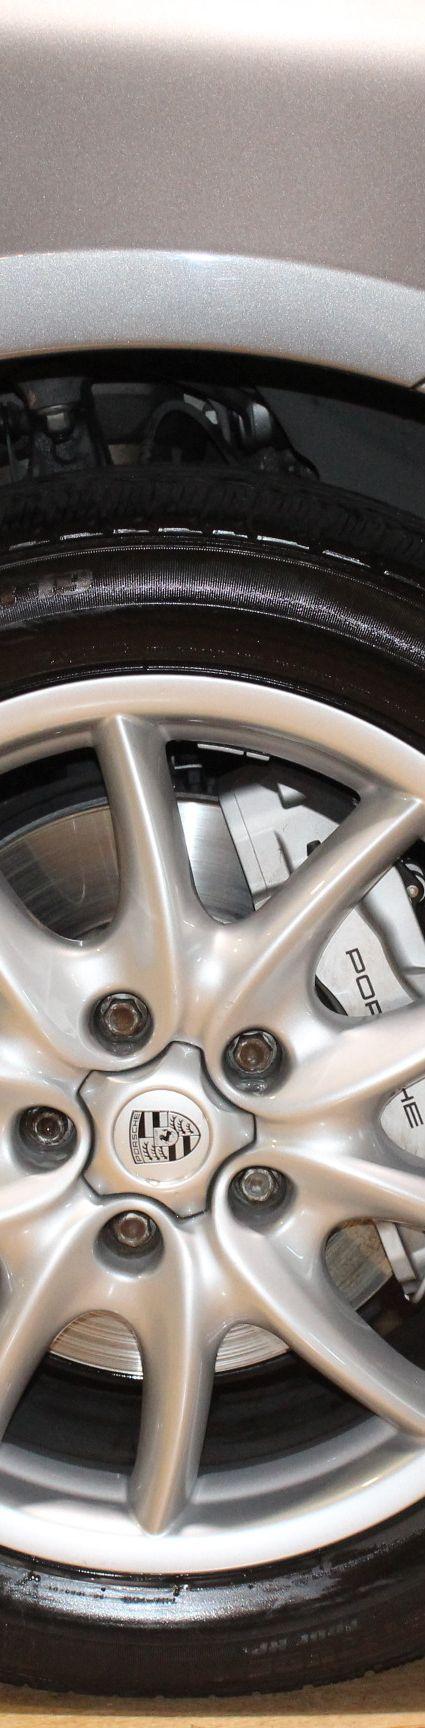 2009 Porsche Cayenne 9PA S Wagon 5dr Spts Auto 6sp 4x4 4.8i [MY09] - for sale in Australia